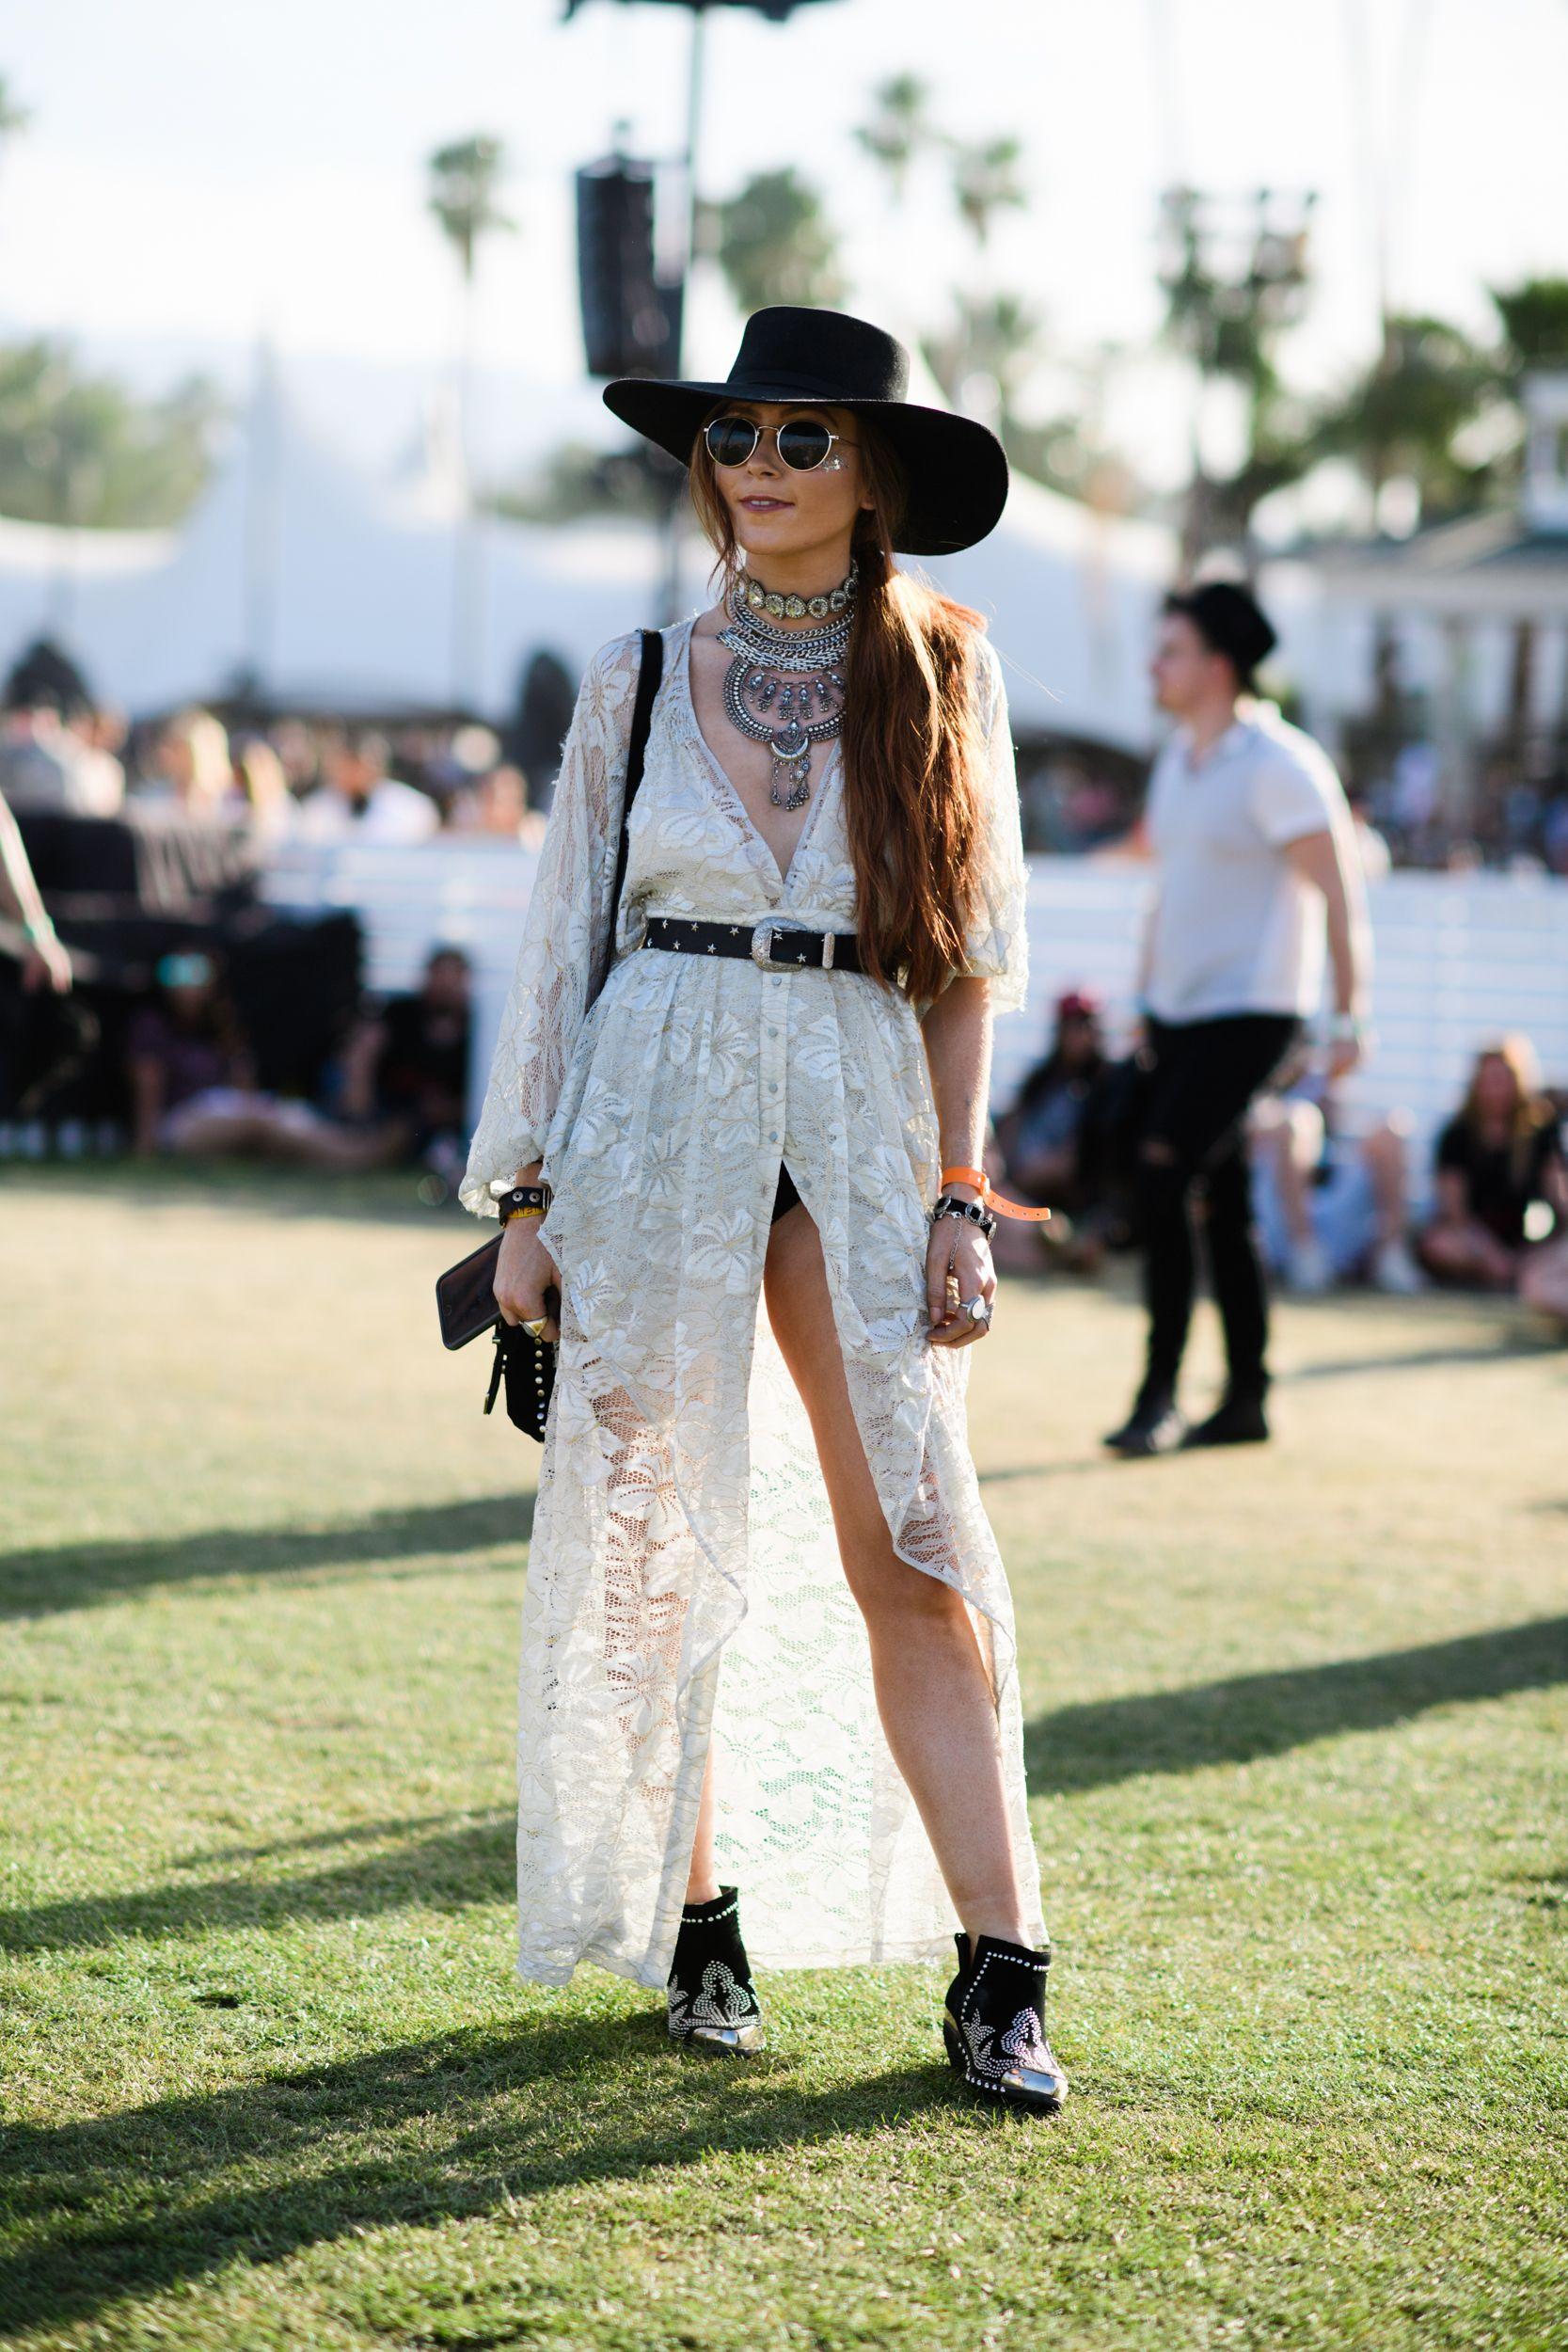 83d080cea71 Best Coachella Street Style 2017 - Festival Style From Coachella